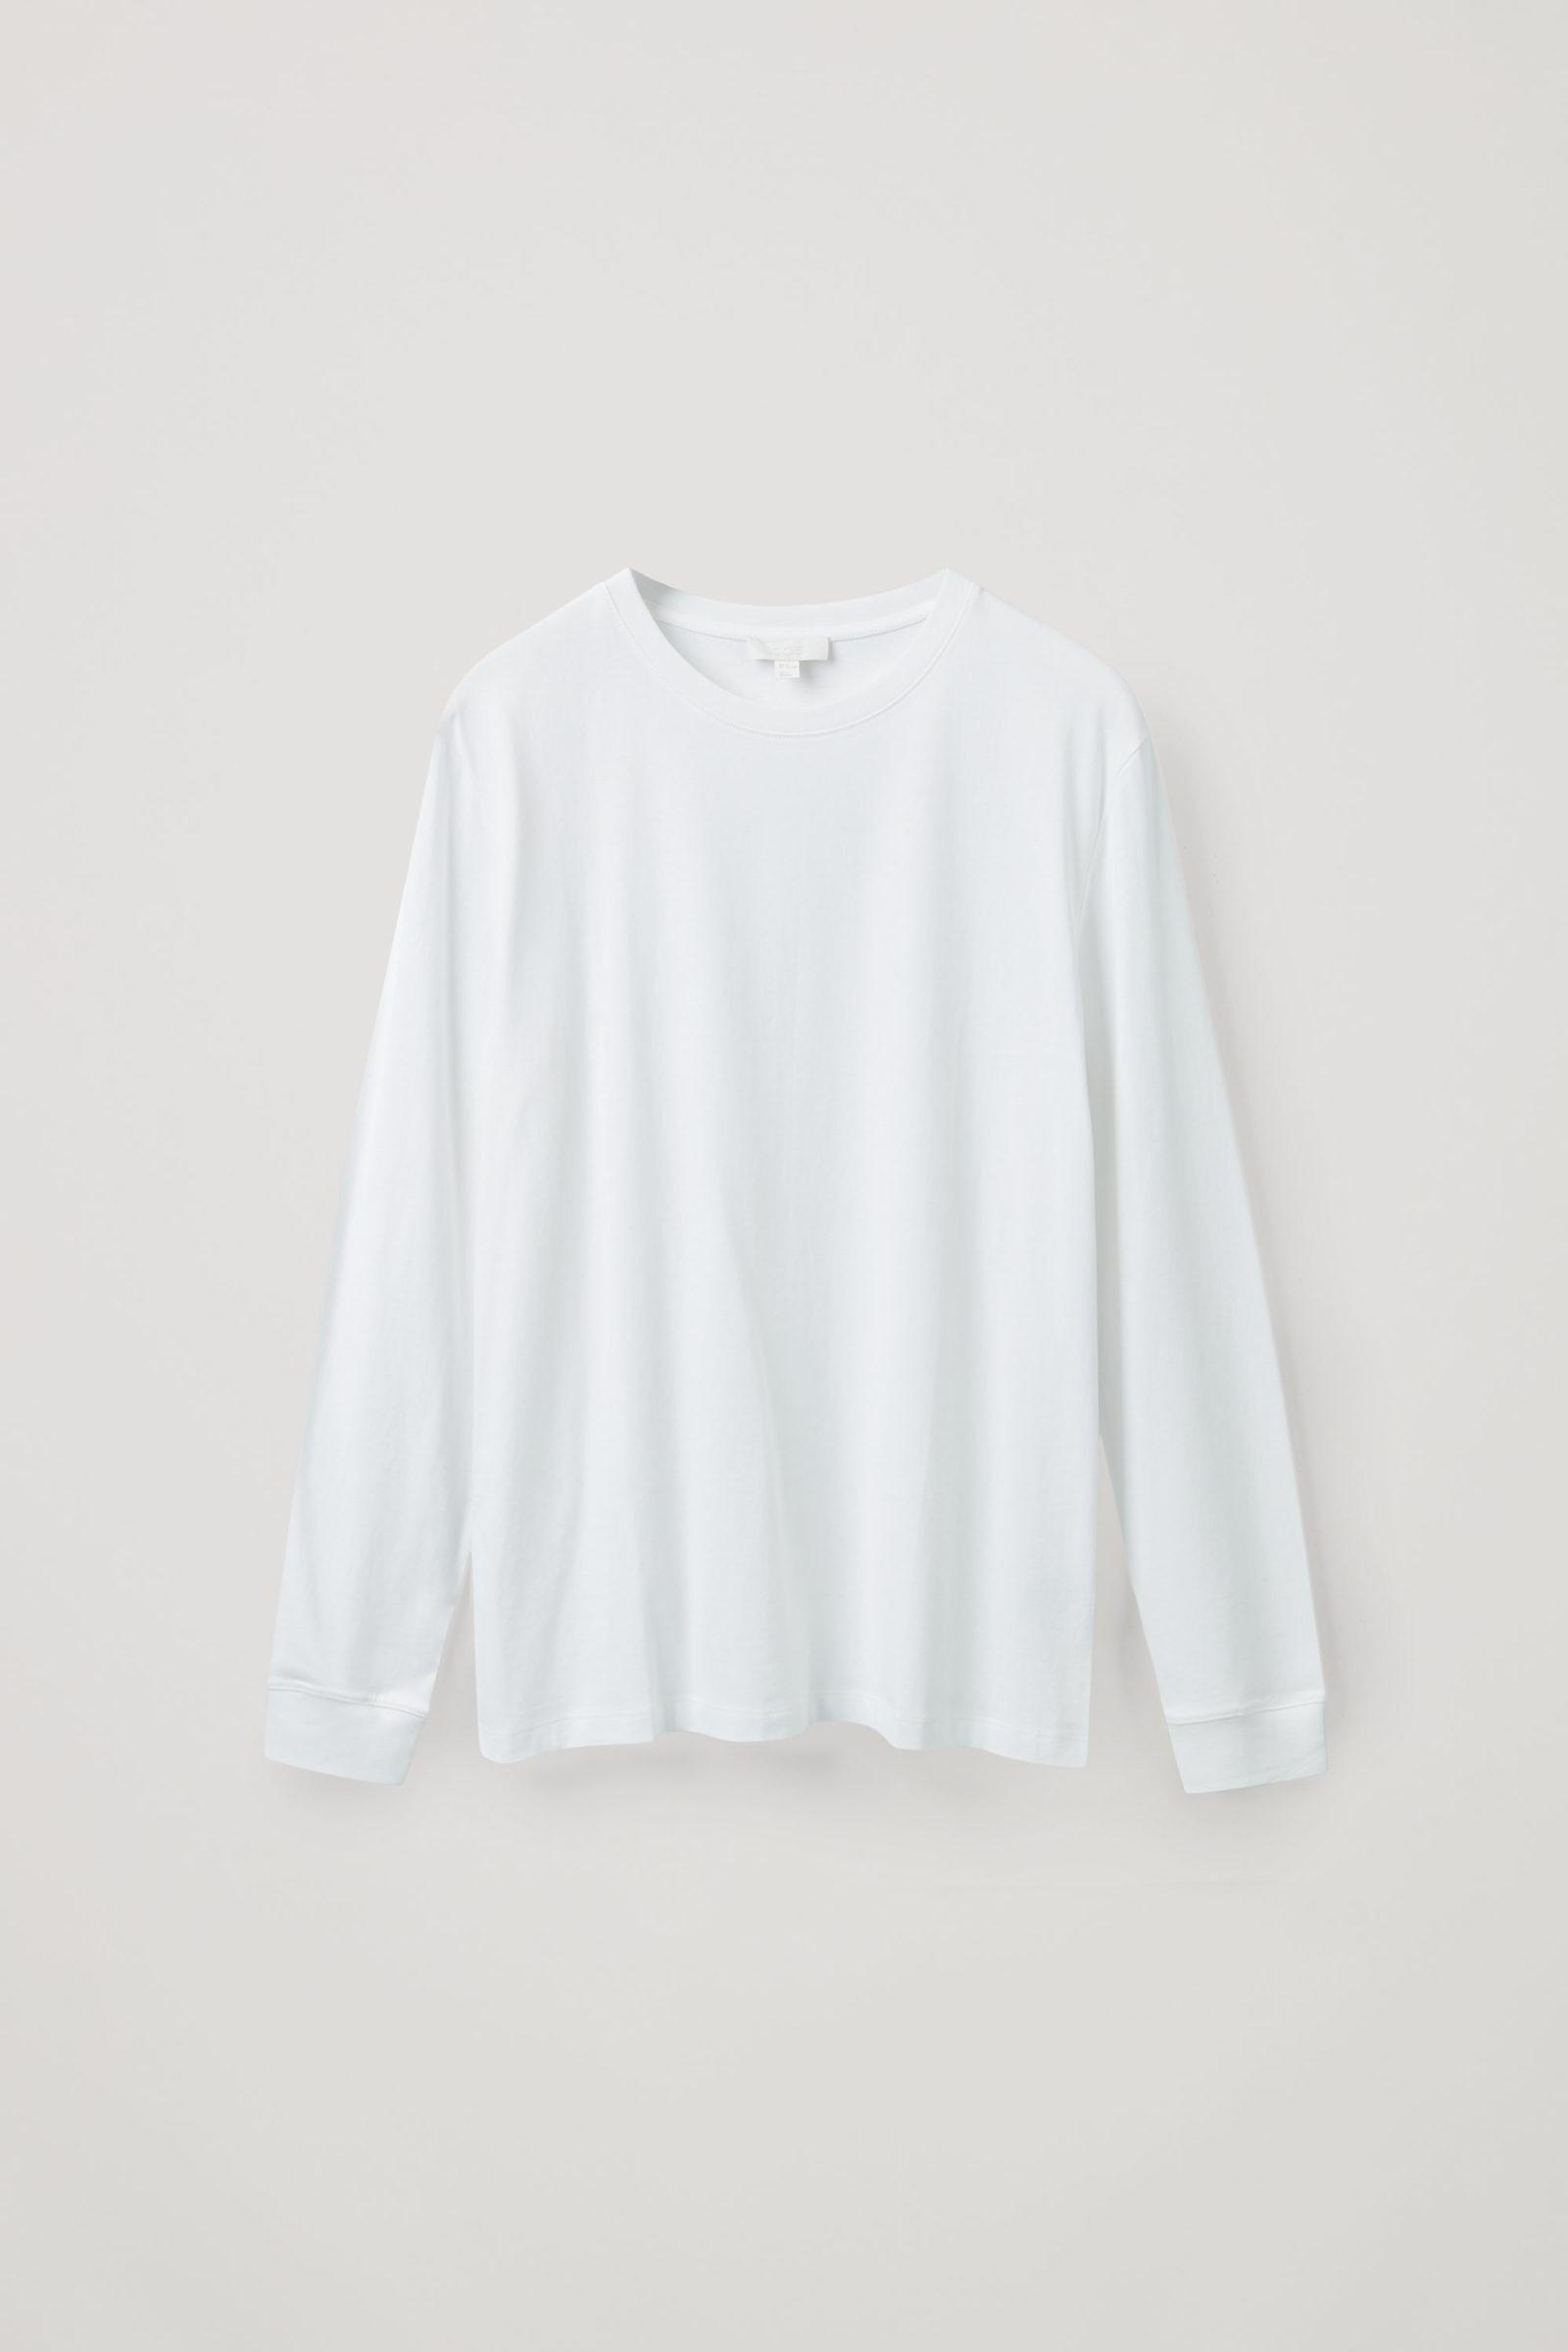 COS 브러쉬드 롱 슬리브 티셔츠의 화이트컬러 Product입니다.